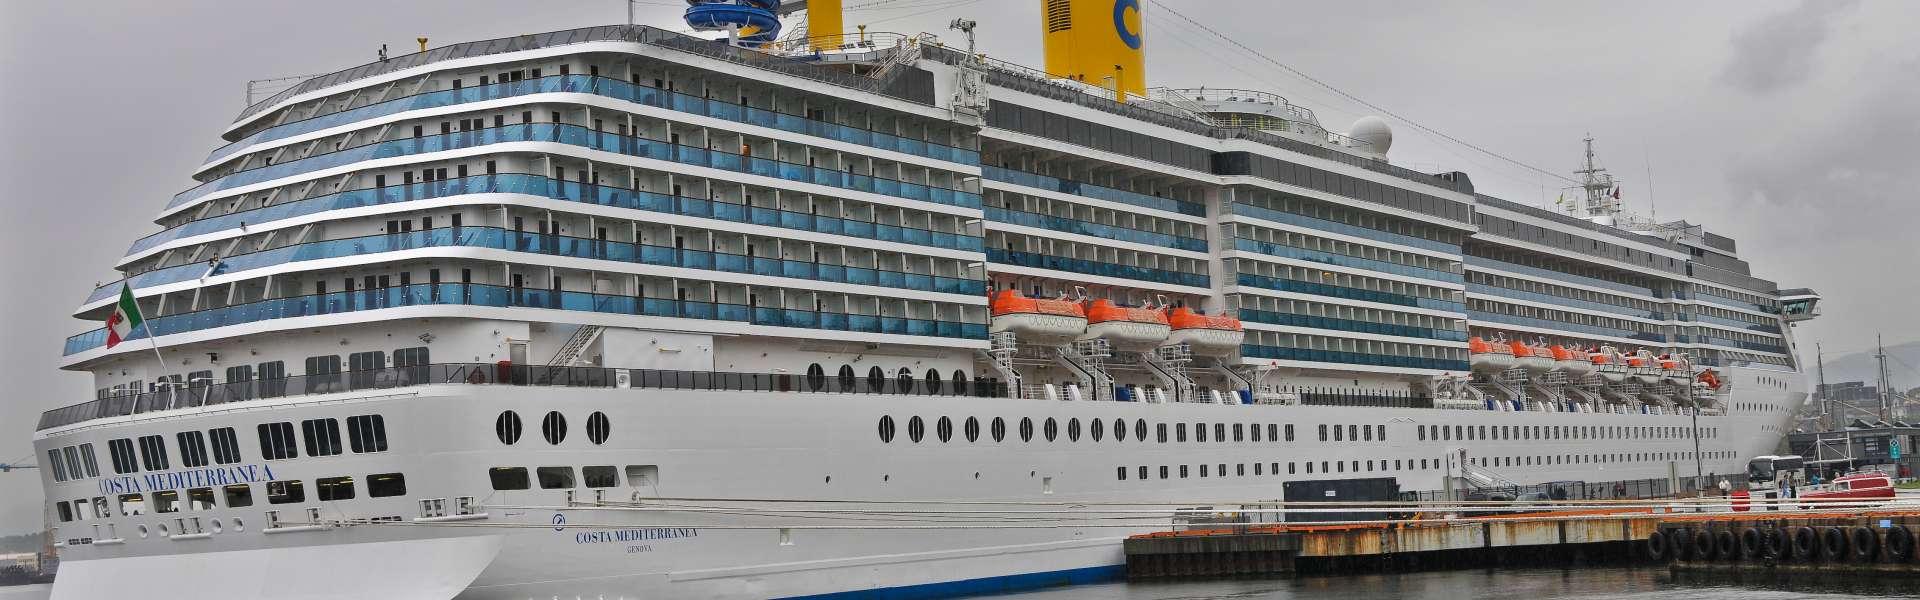 Croaziera 2019 - Asia/Africa si Orientul Mijlociu (Abu Dhabi) - Costa Cruises - Costa Mediterranea - 7 nopti